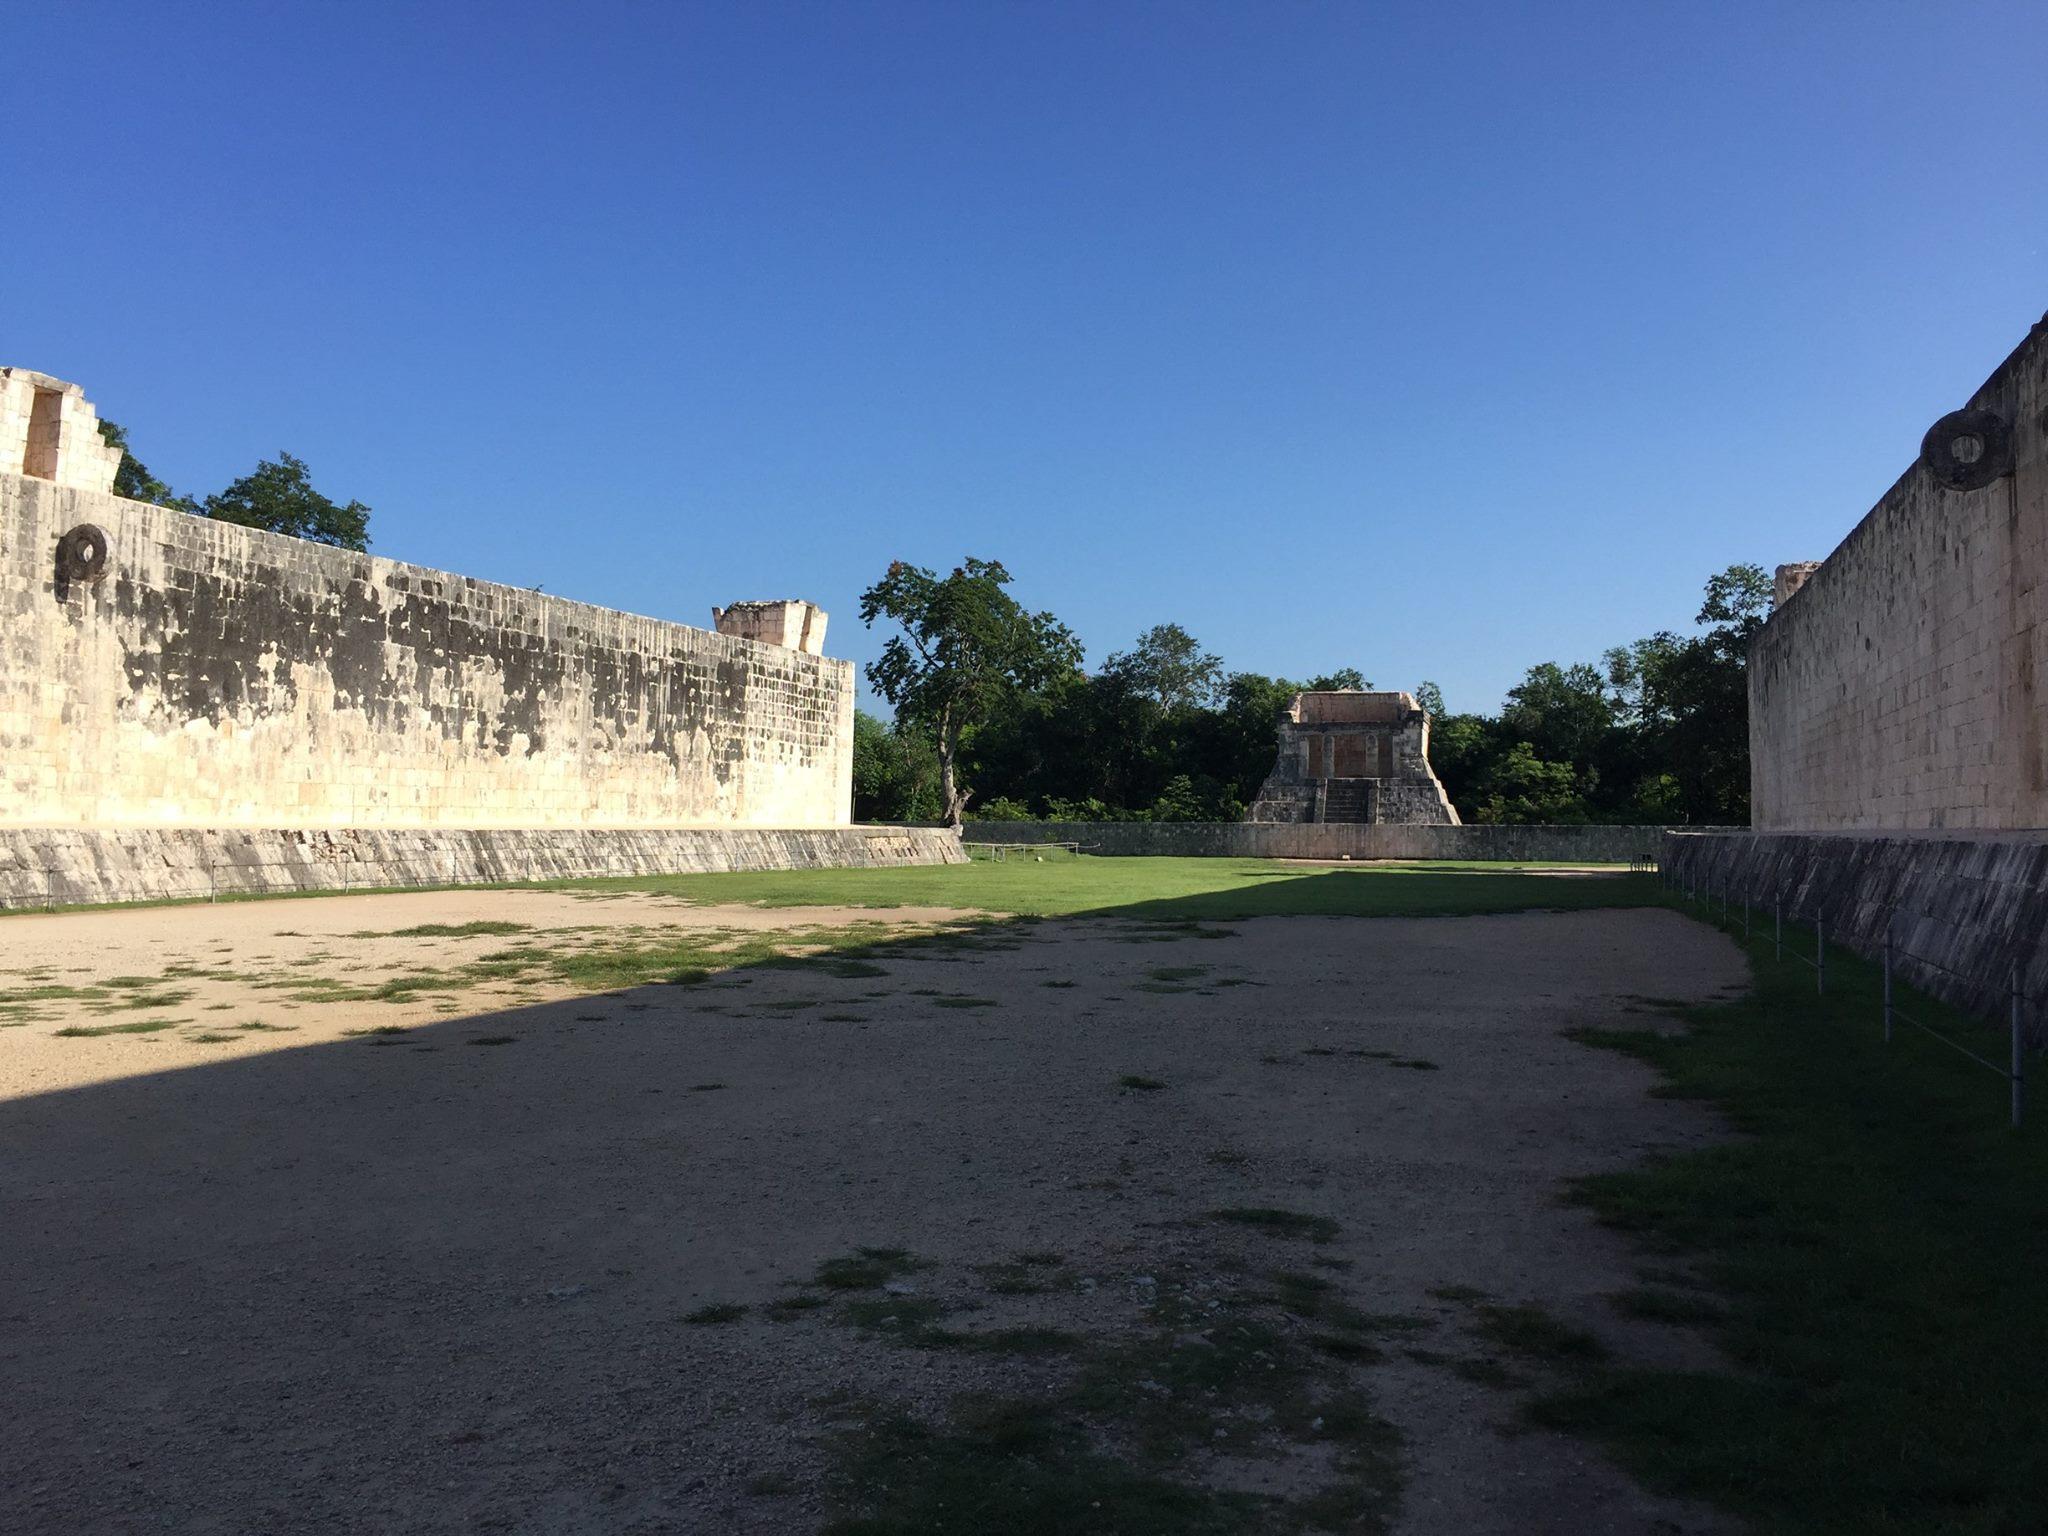 The Ball Court of Chichen Itza